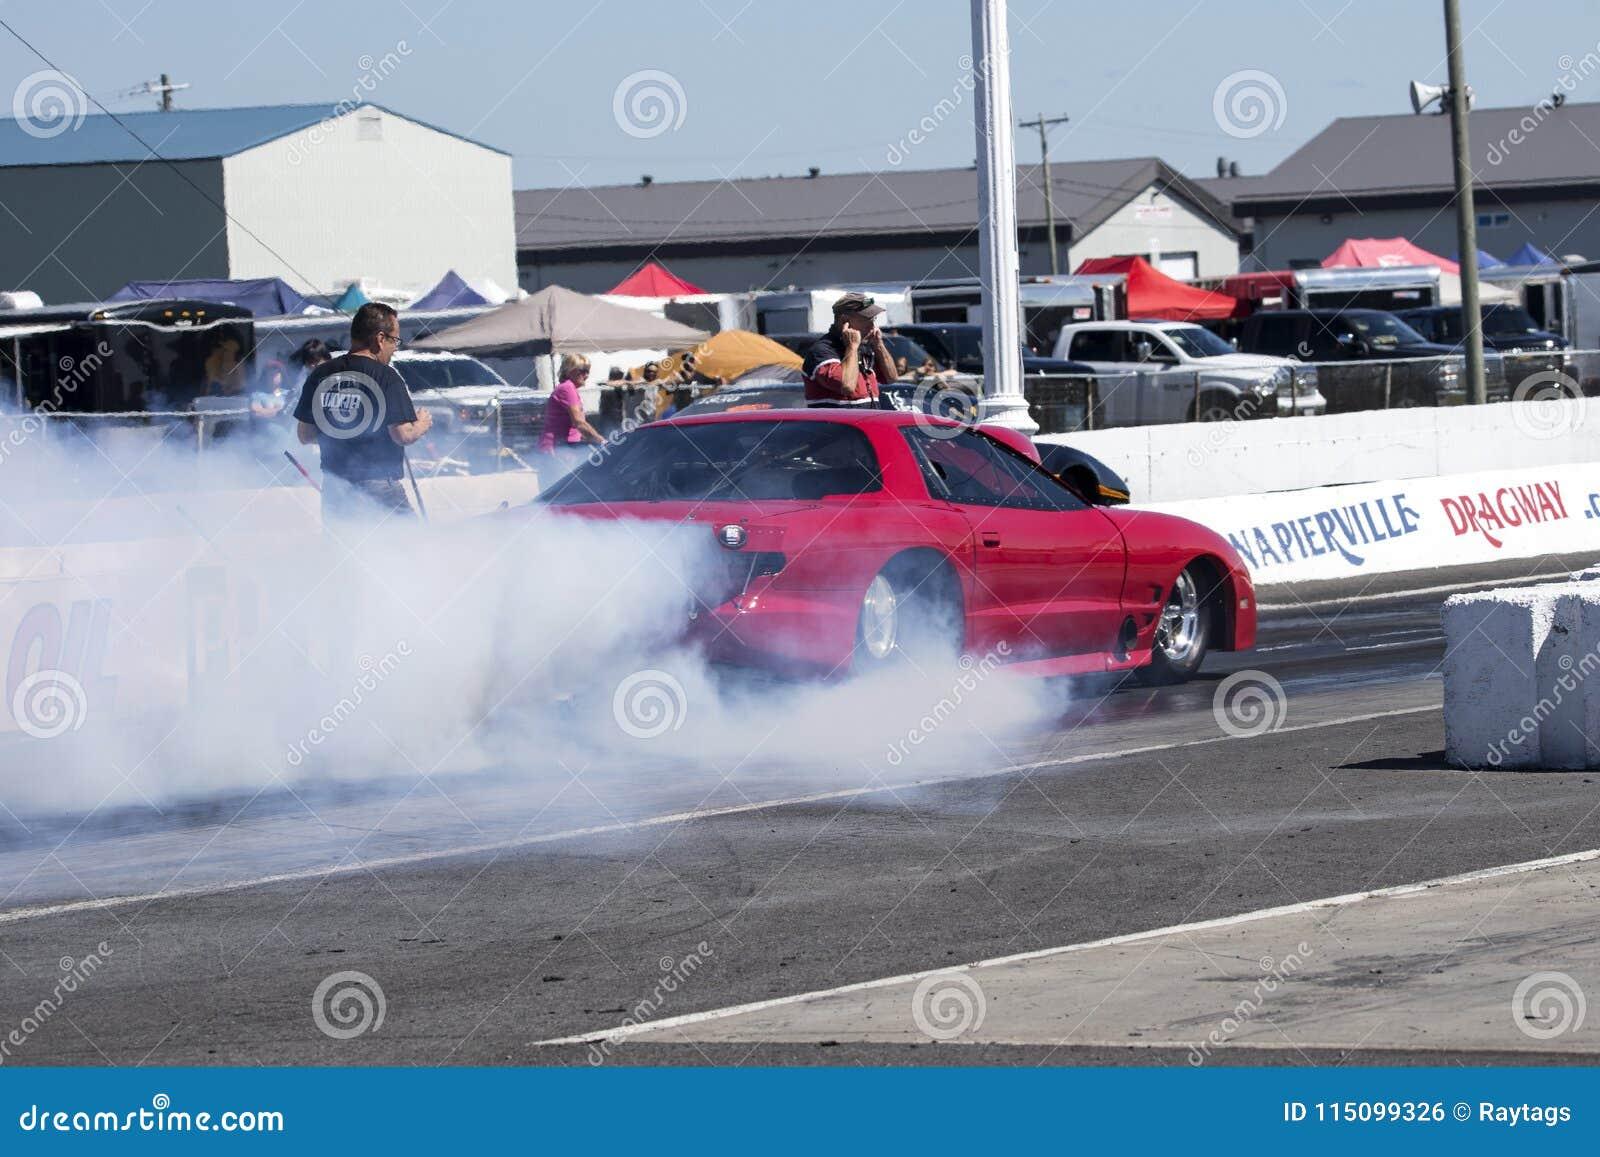 Pontiac Firebird Drag Car Making A Smoke Show On The Track Editorial ...